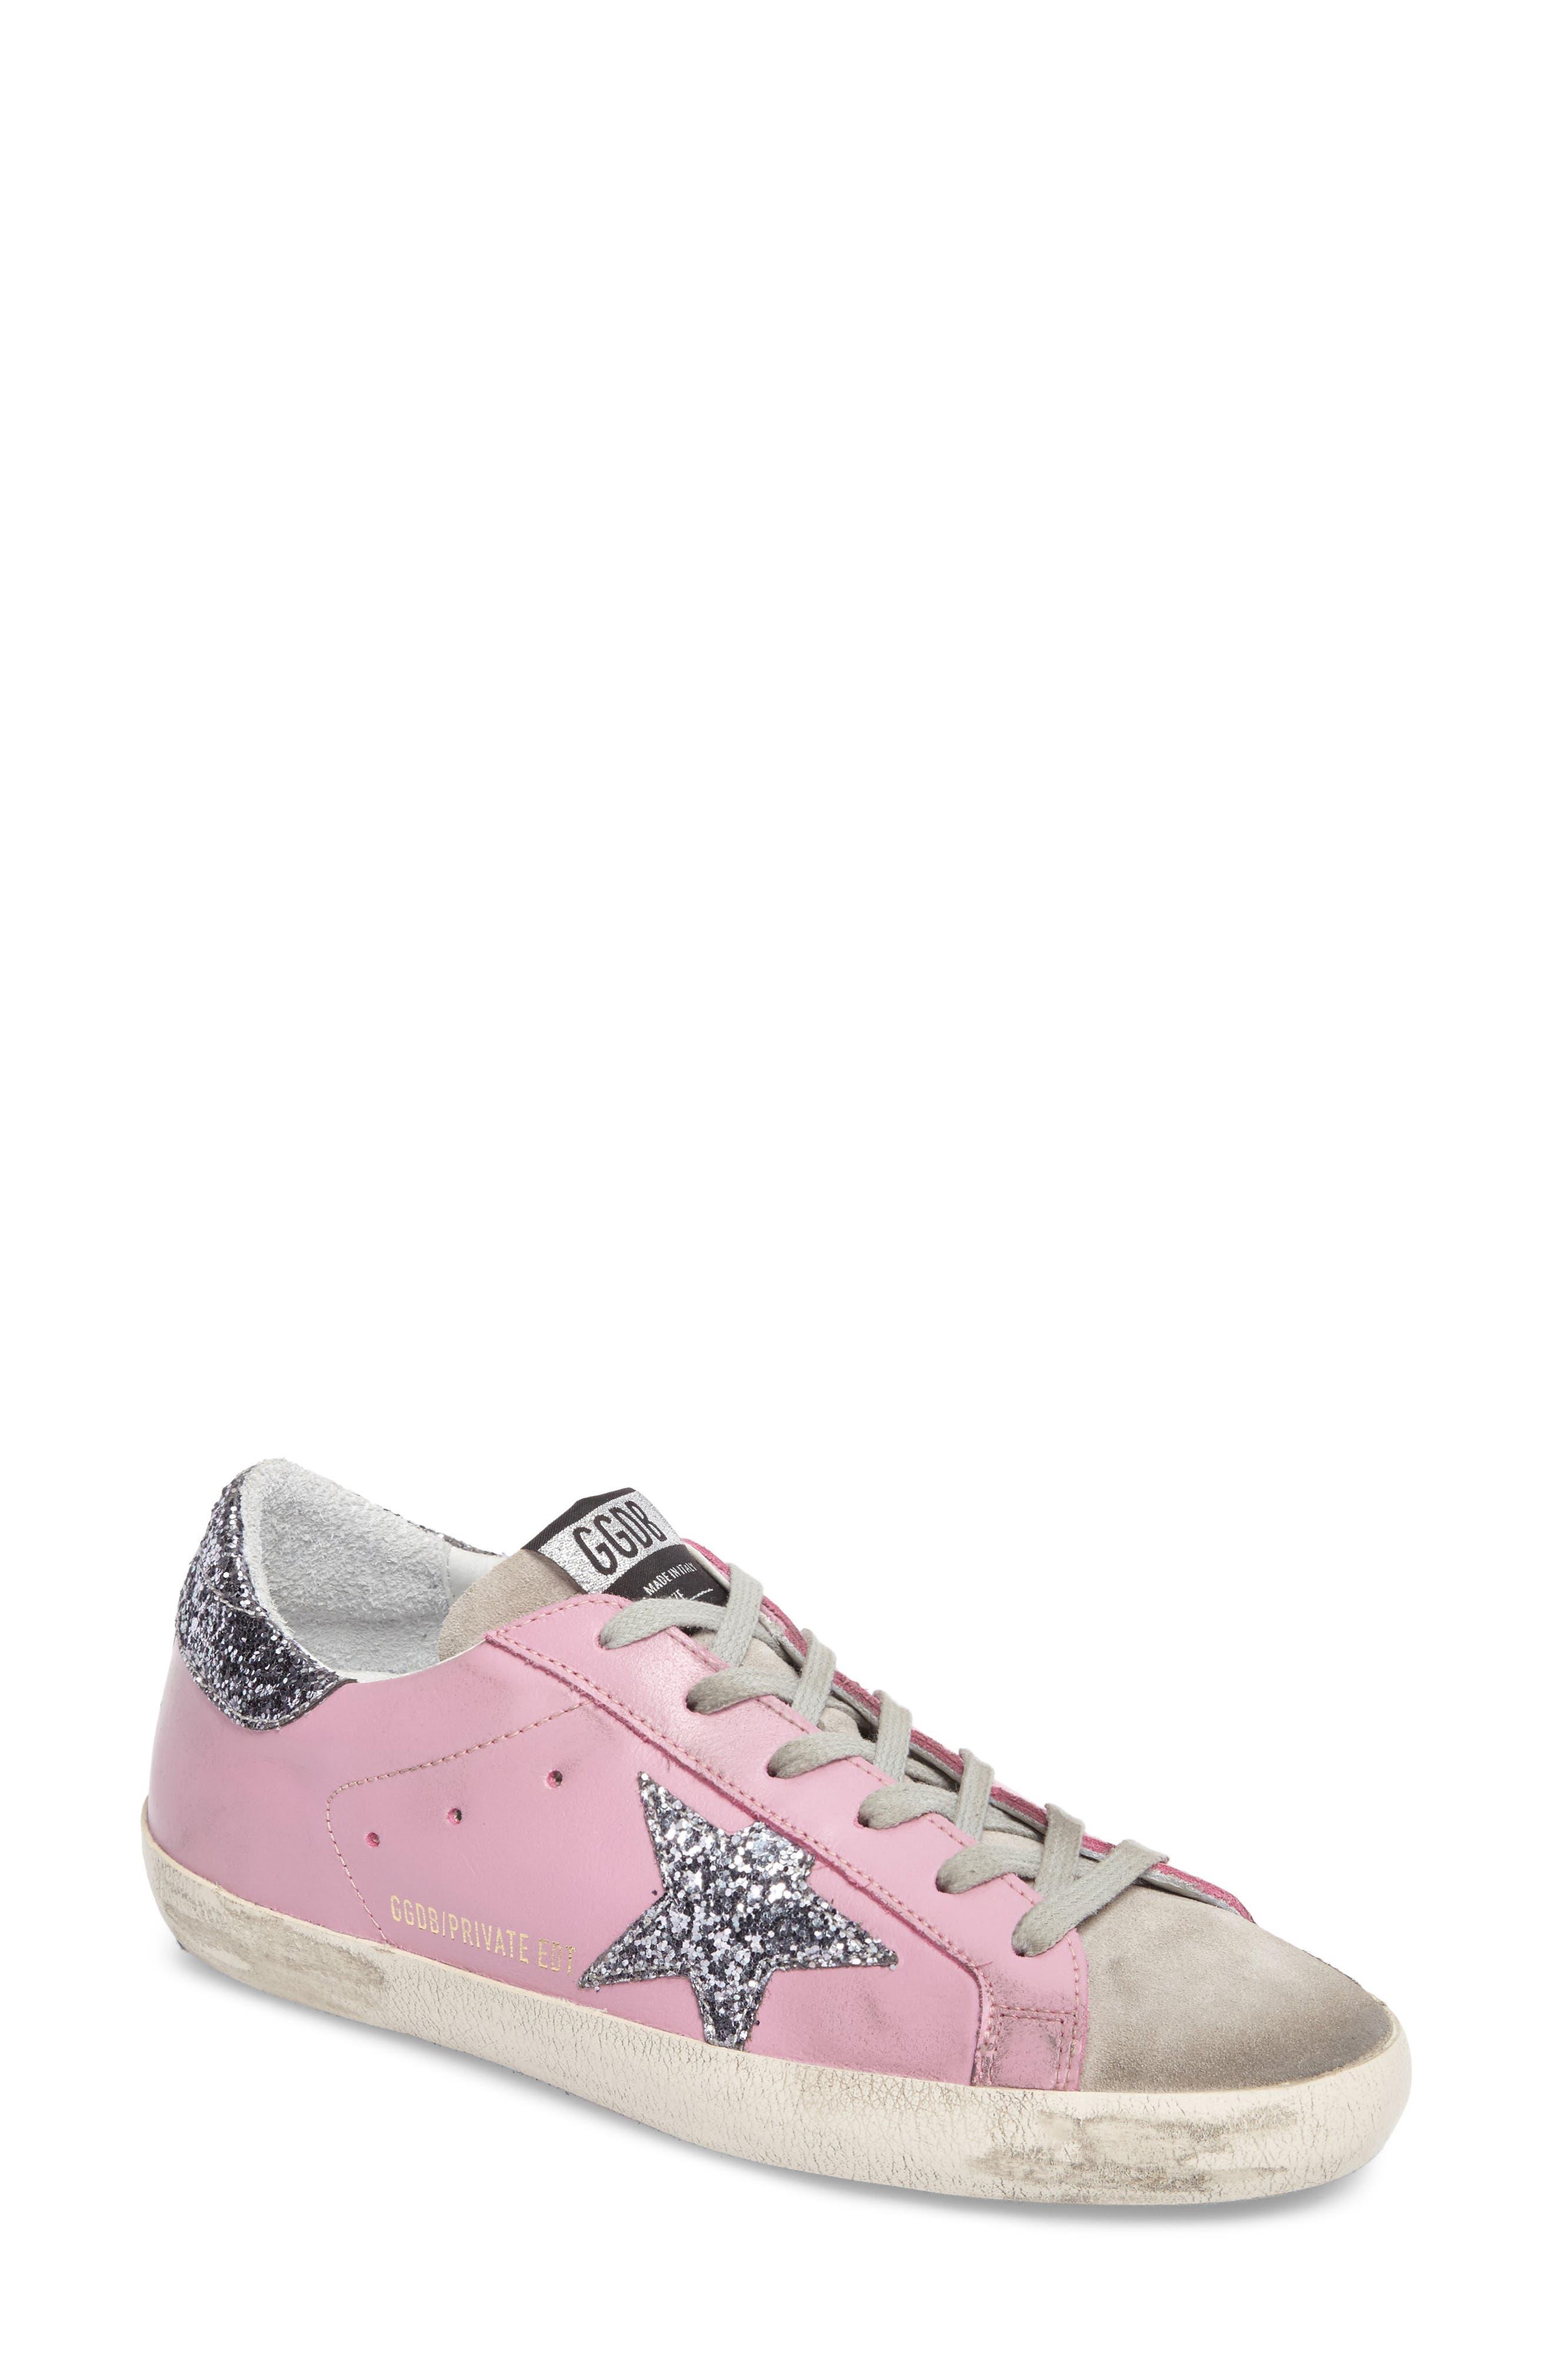 Superstar Low Top Sneaker,                             Main thumbnail 1, color,                             Pink/ Grey